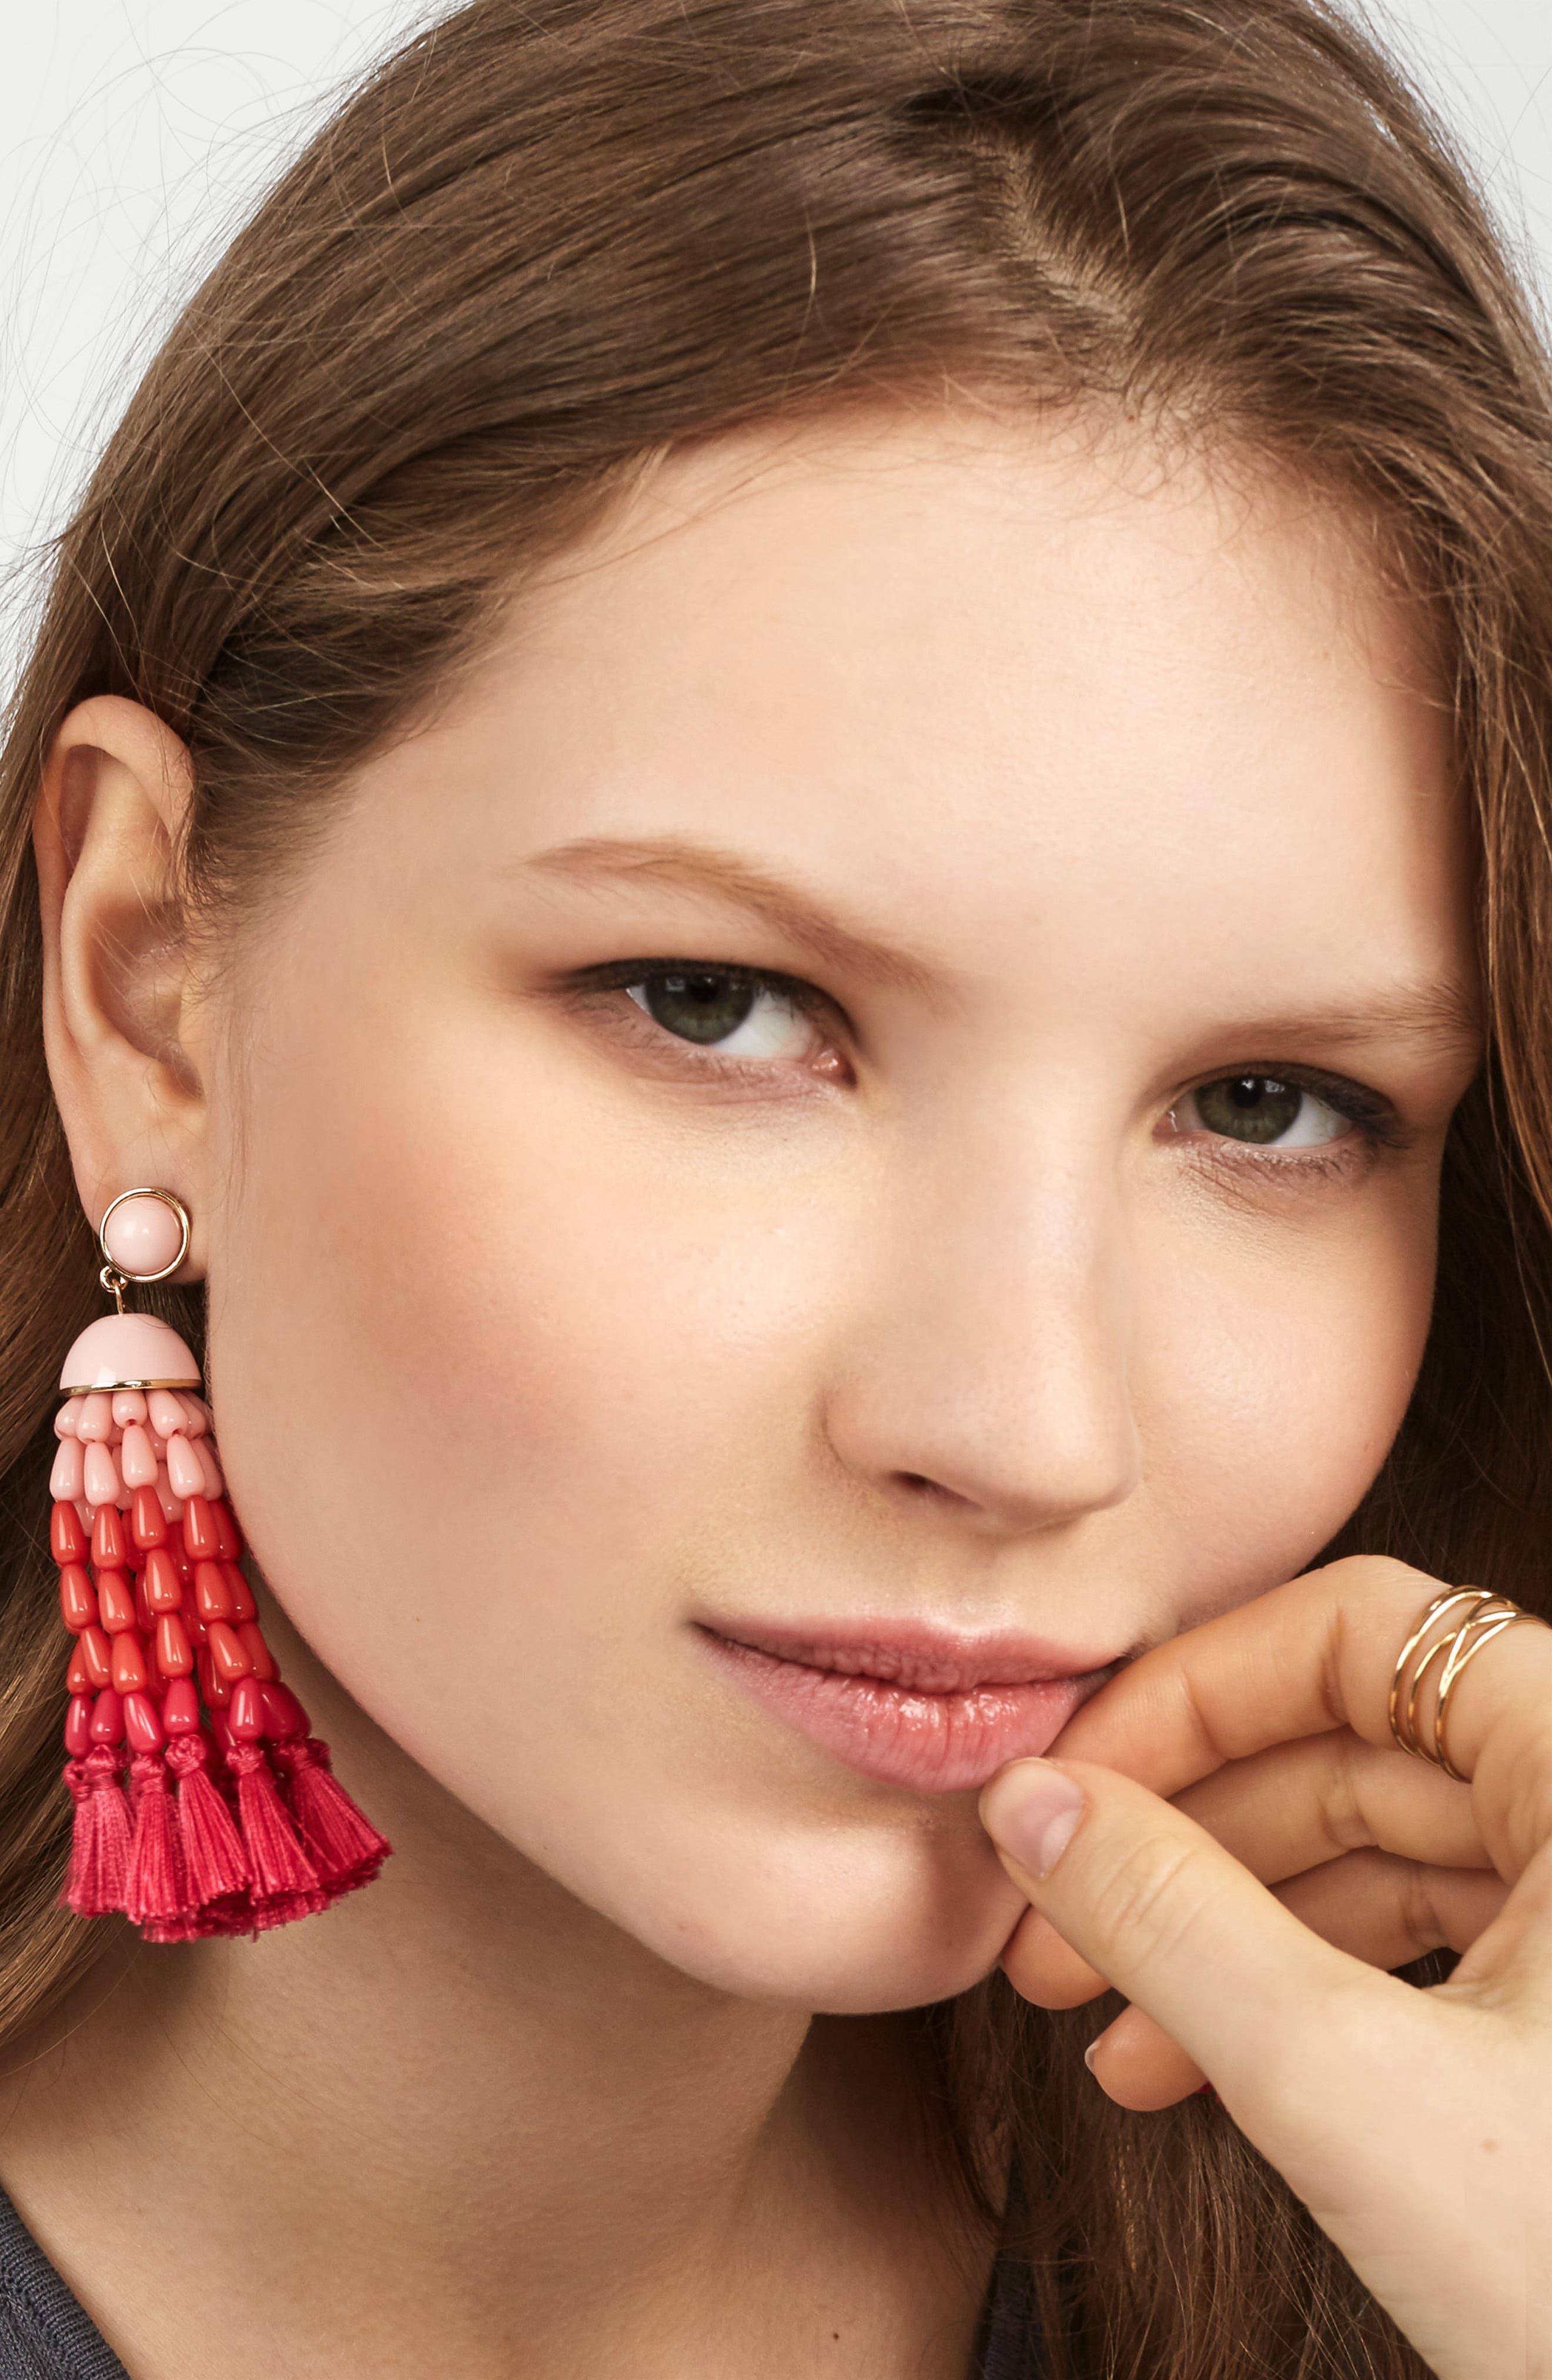 Margarita Beaded Tassel Earrings,                             Alternate thumbnail 2, color,                             Coral Ombre